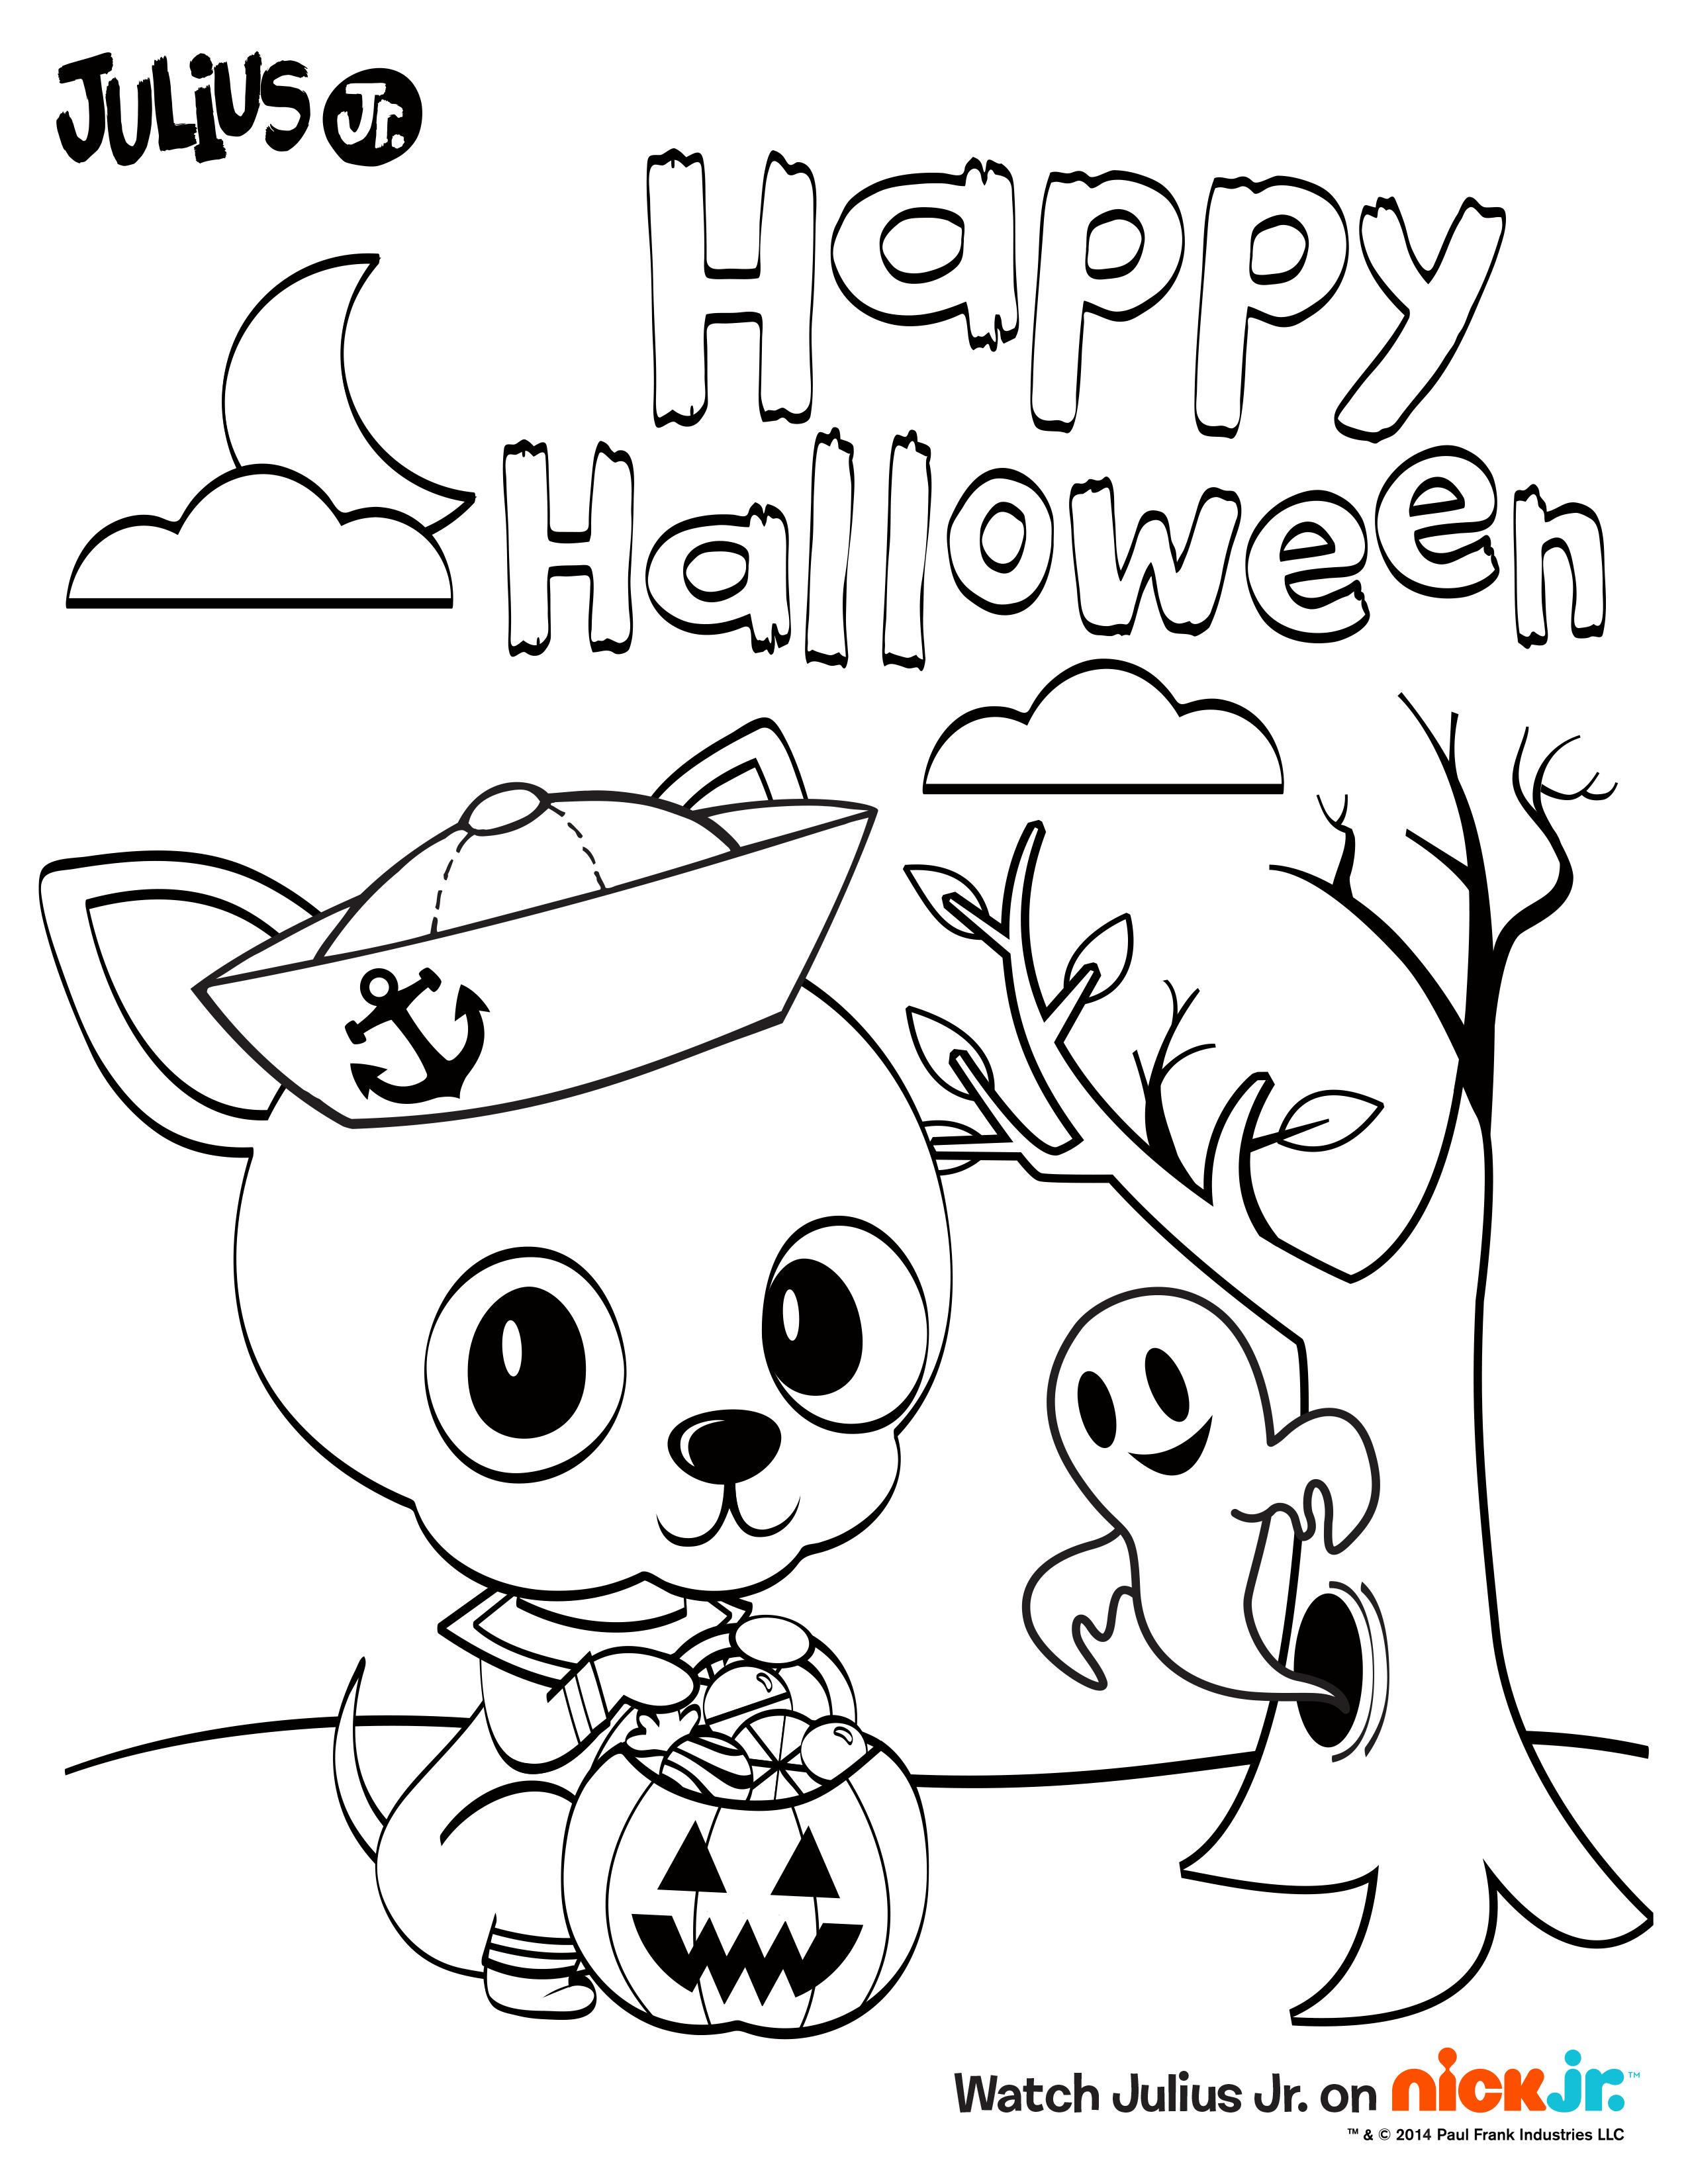 Halloween Chachi! Enjoy this fun Julius Jr. printable